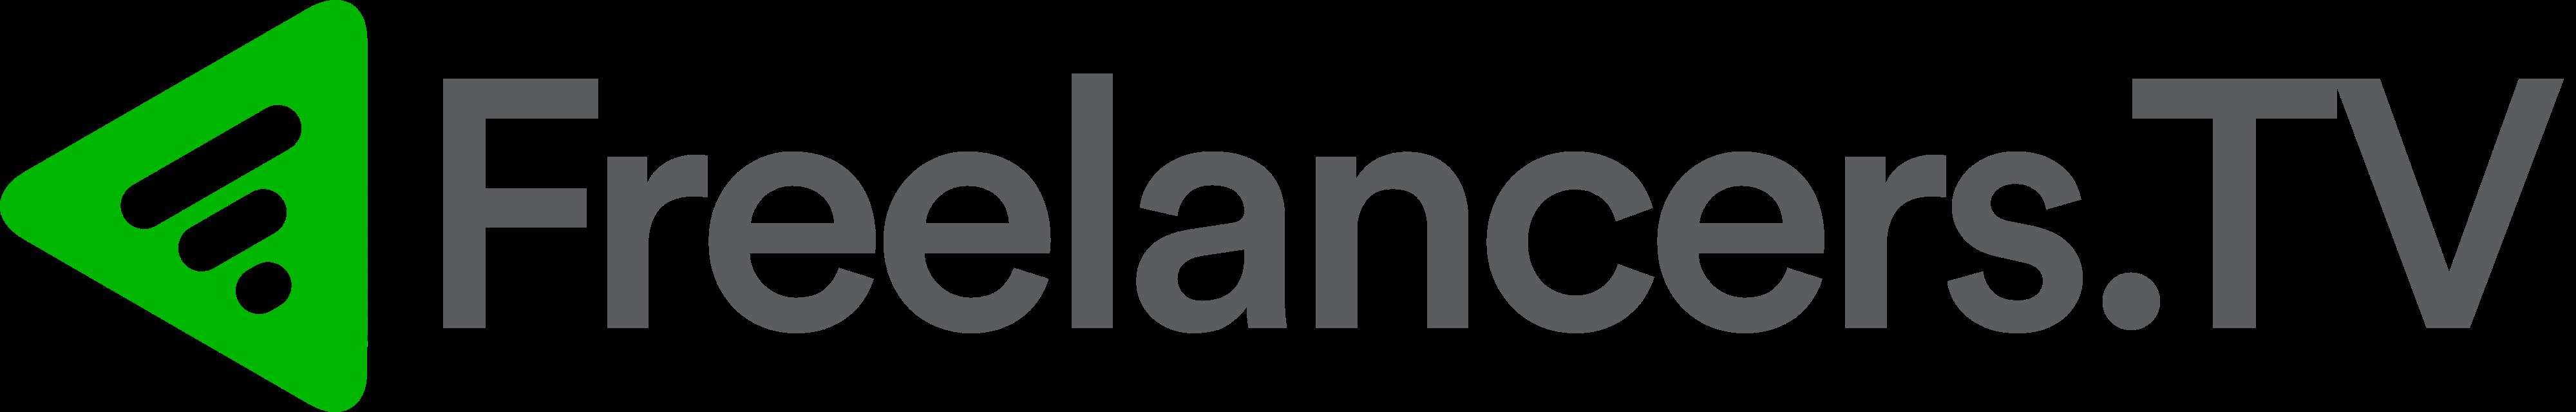 Freelancers tv